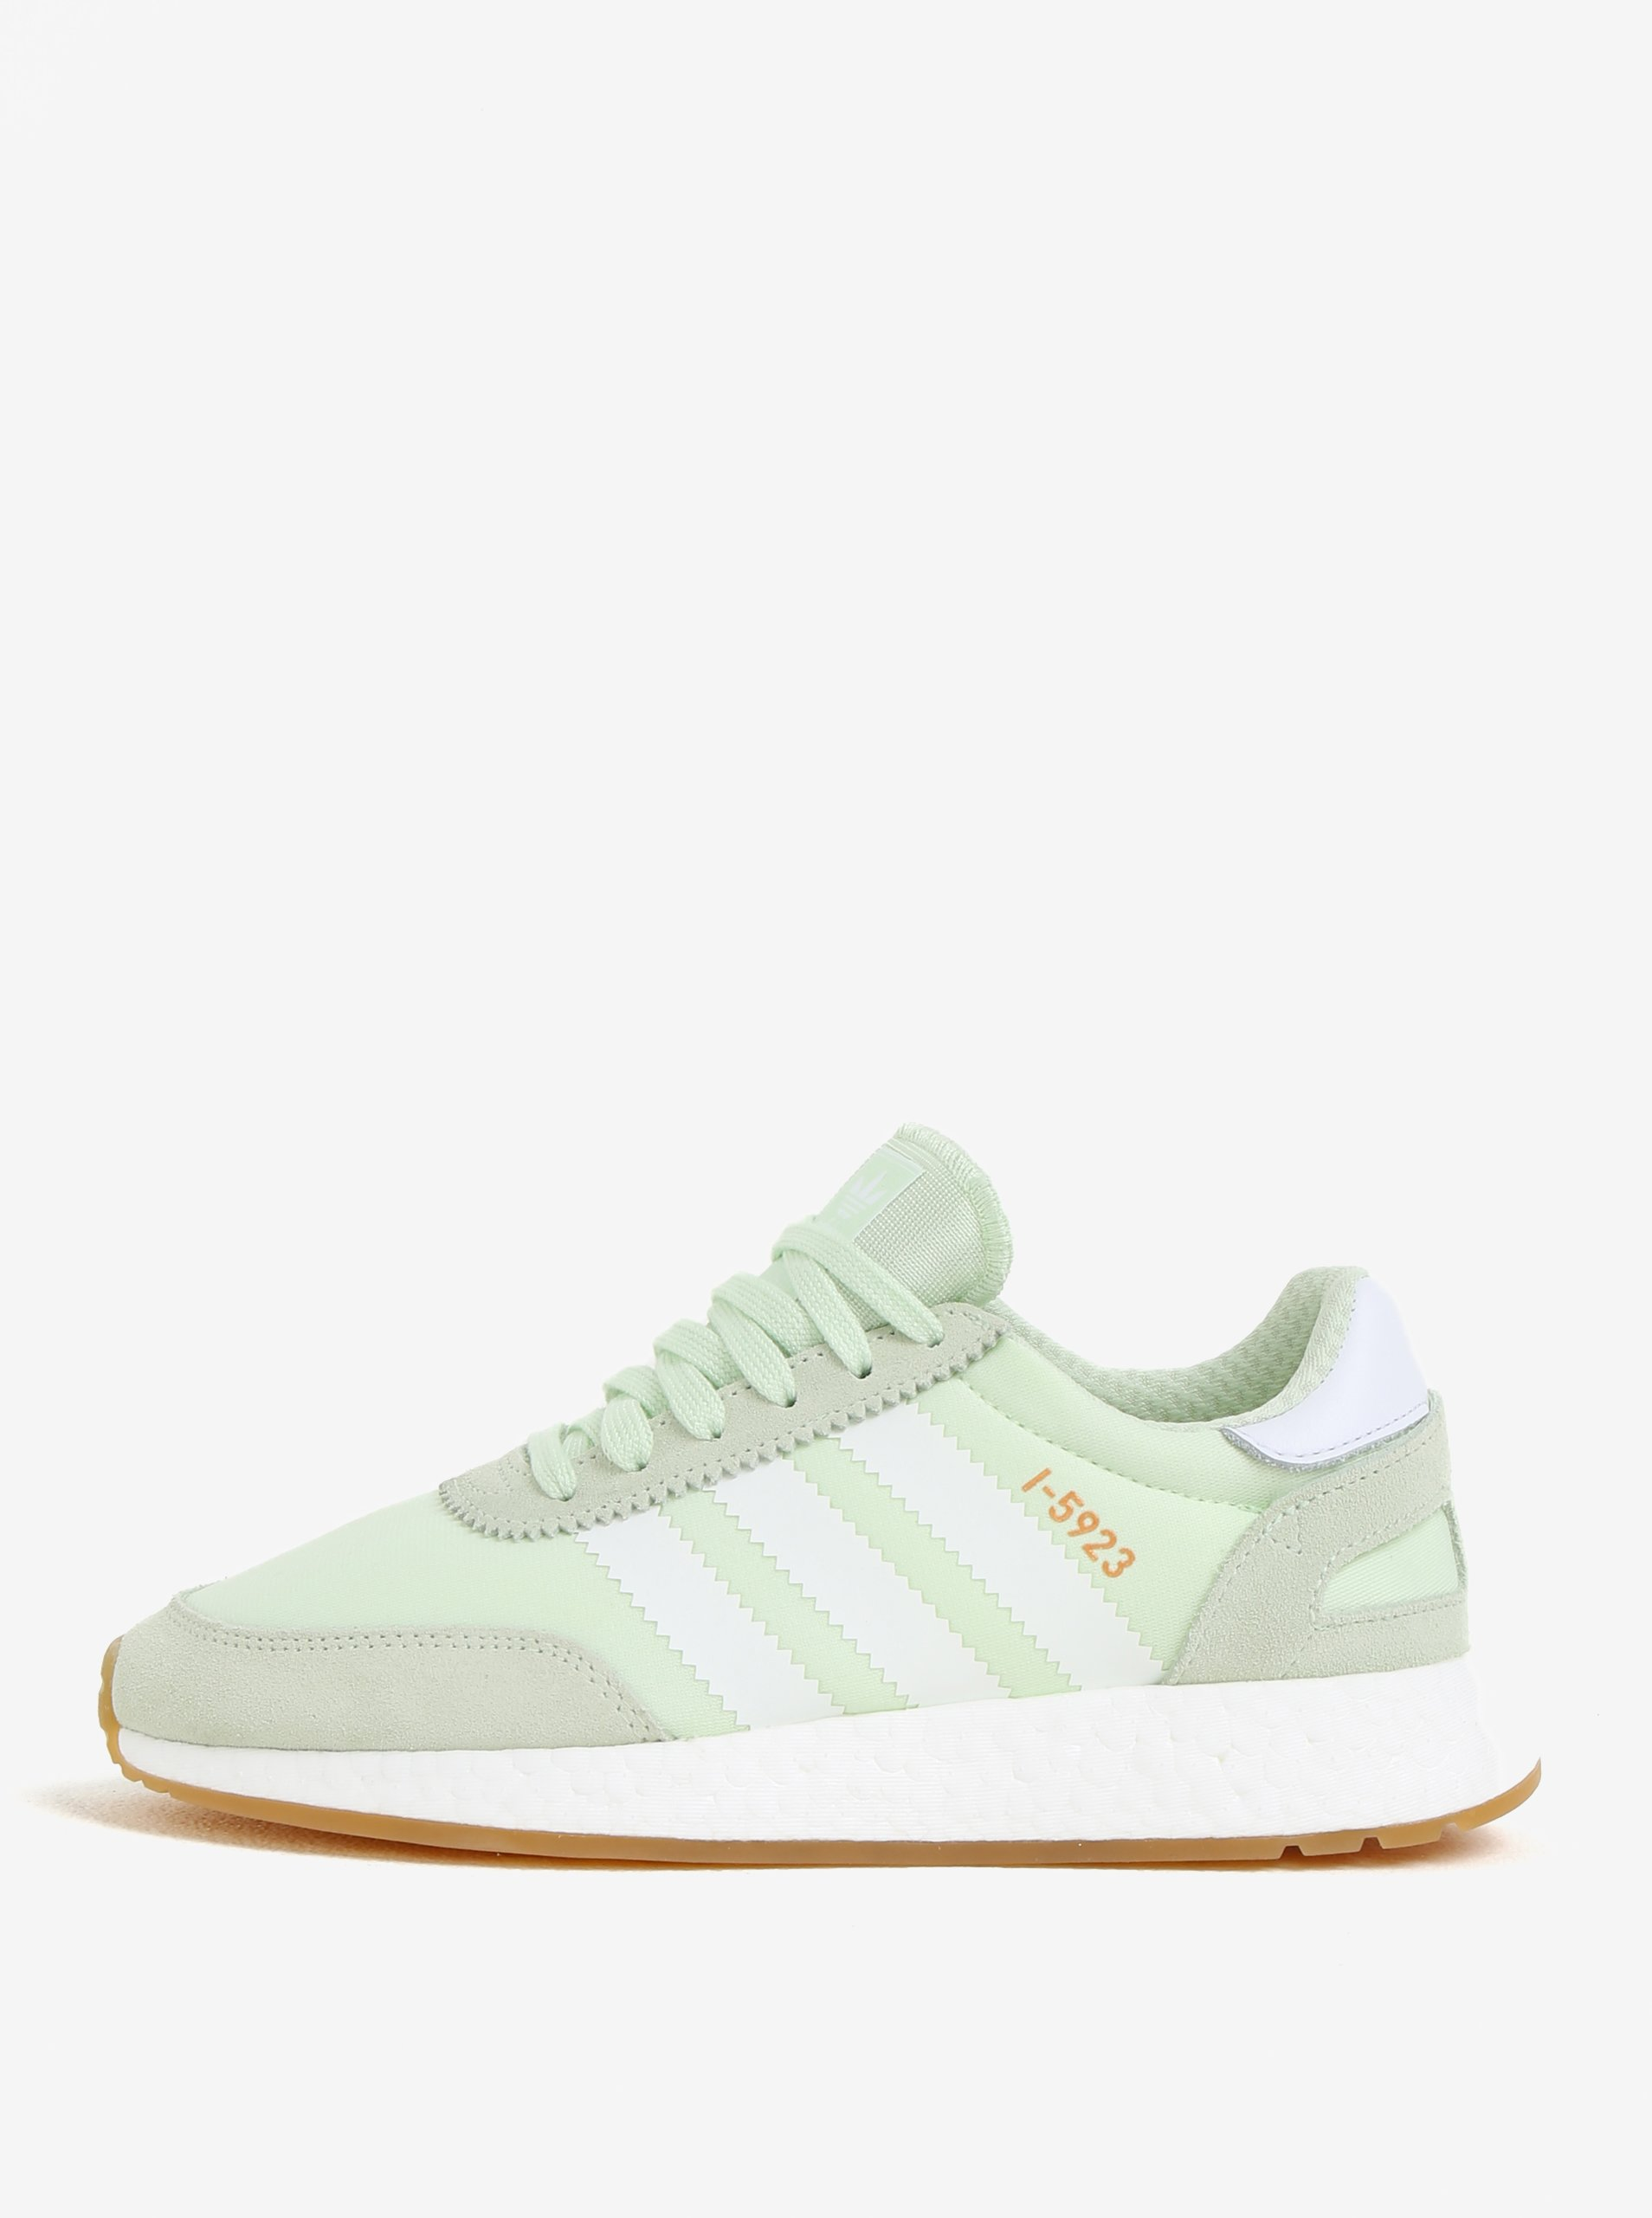 9a5af123a1ecb Zelené dámske tenisky adidas Originals Iniki Runner | Moda.sk